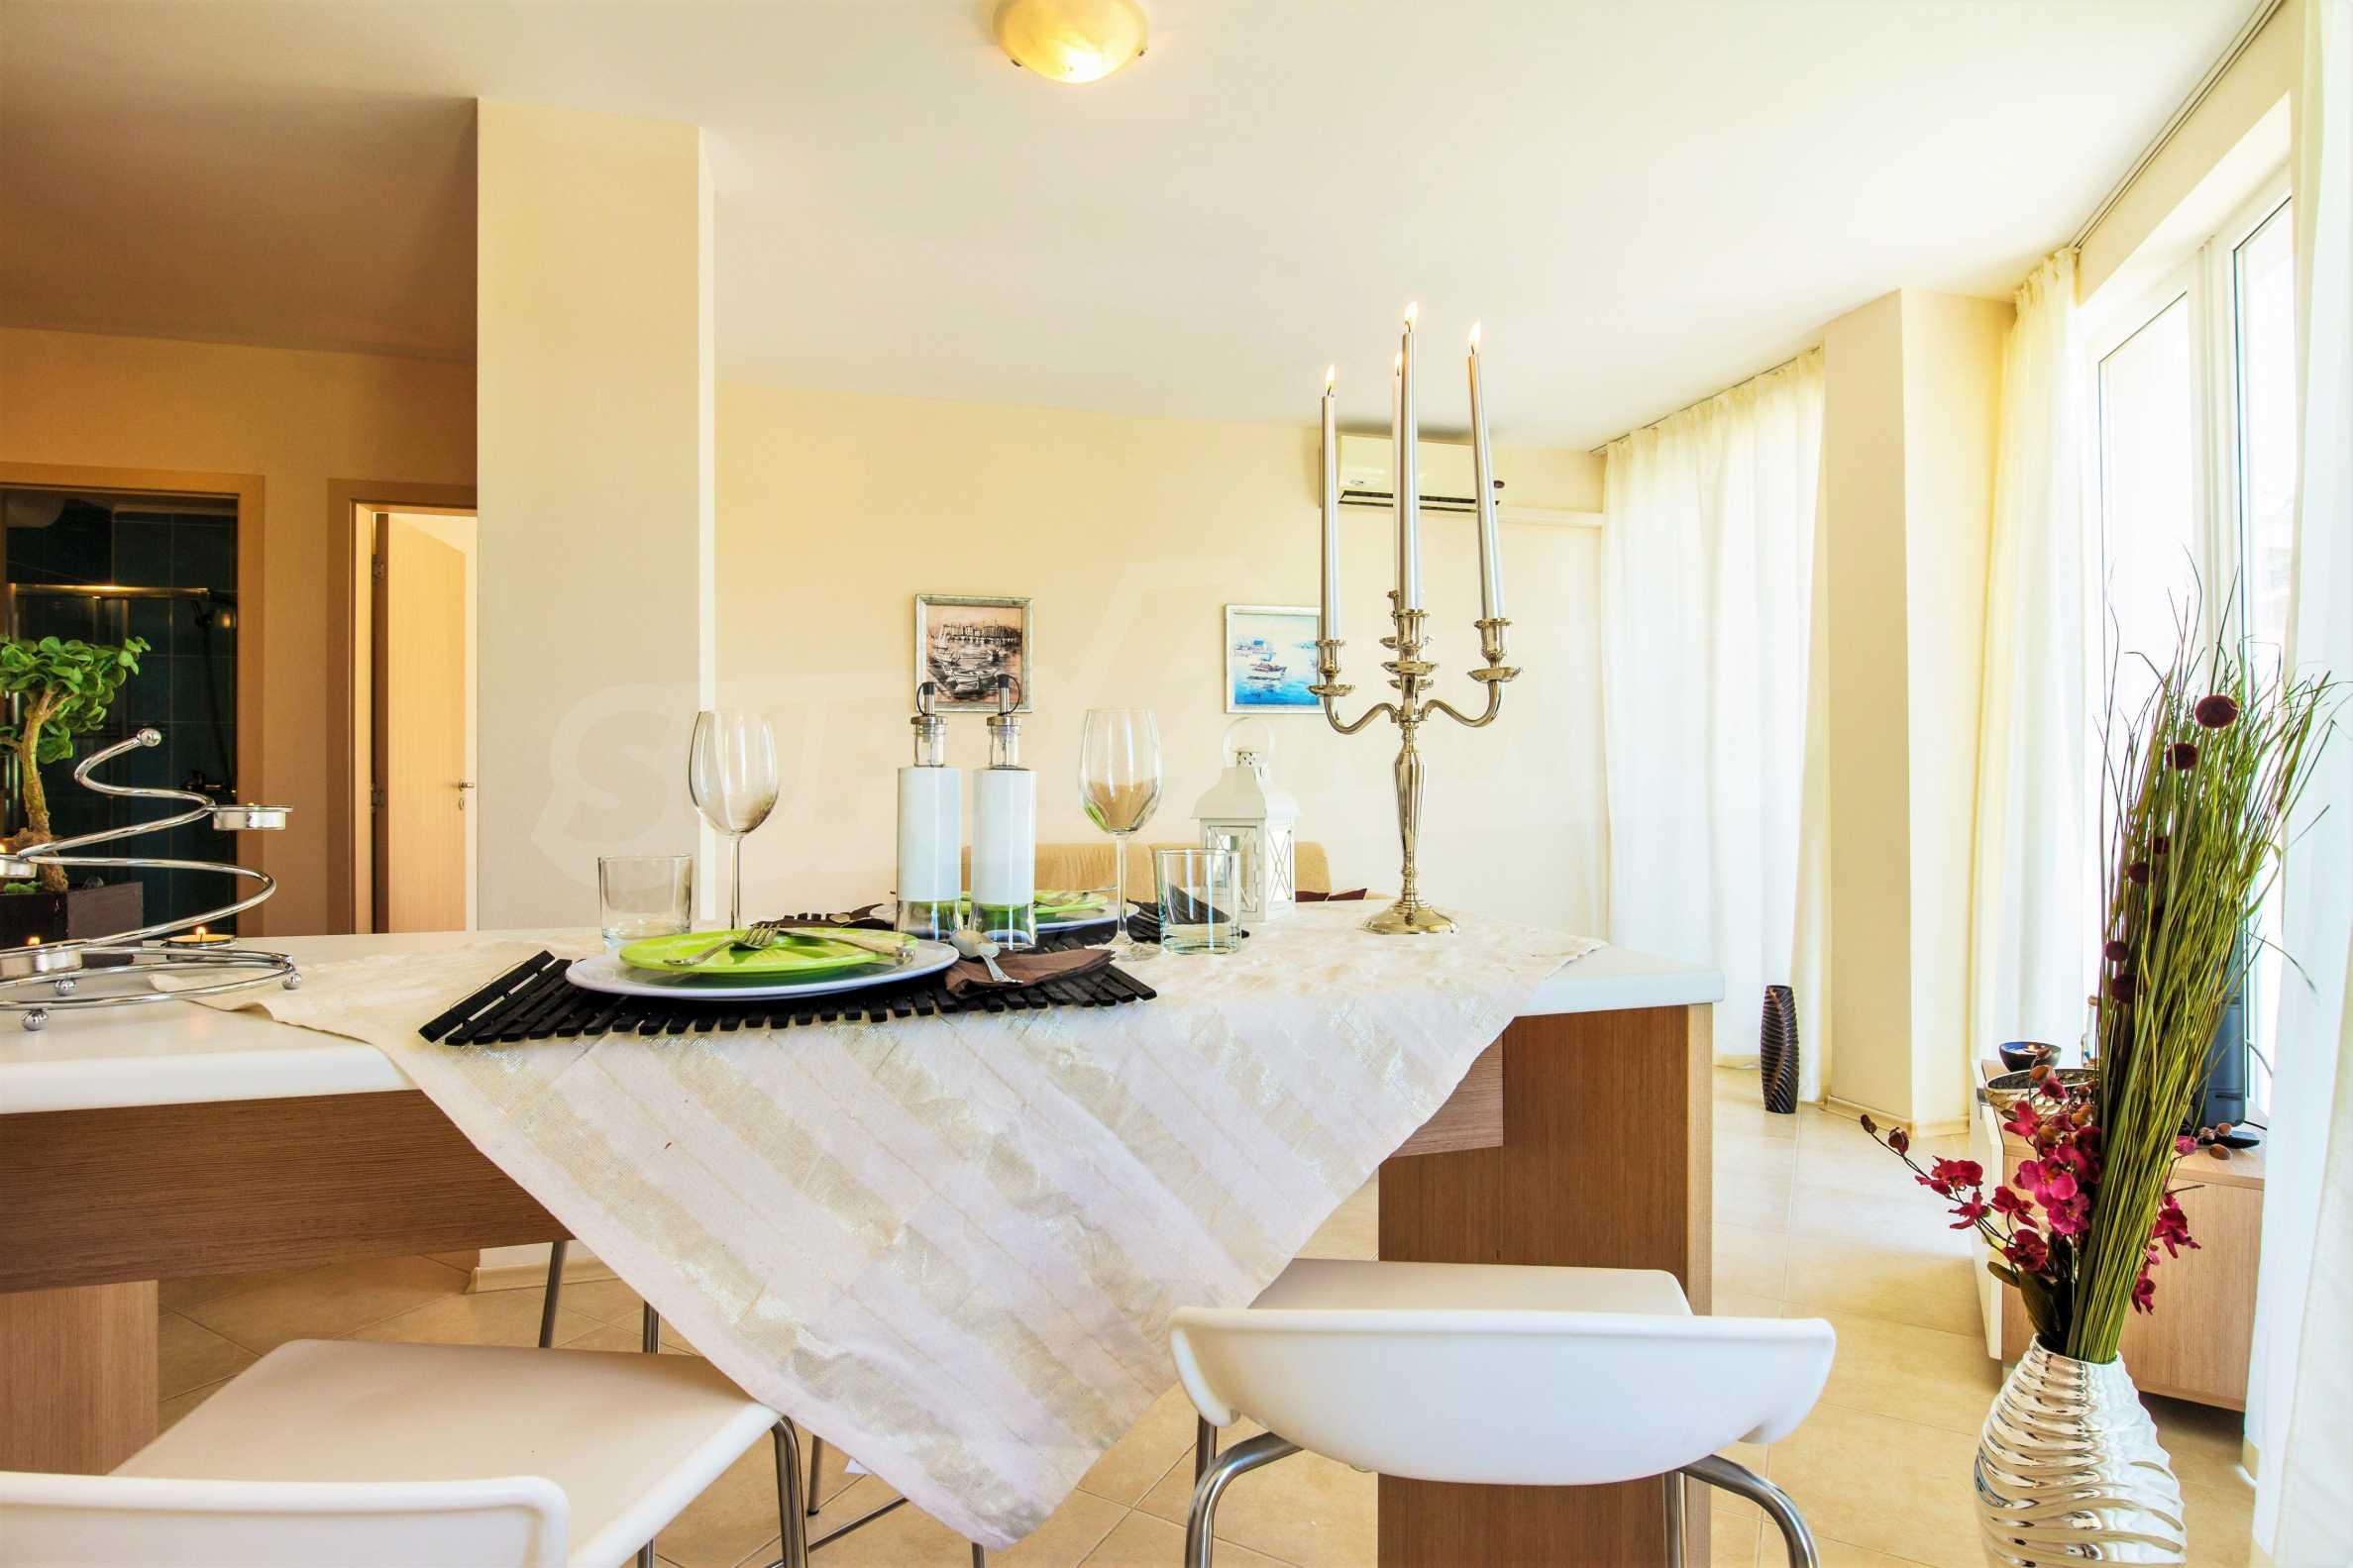 Тристаен апартамент в комплекс Емберли близо до плажа в Лозенец (ап. №423) 8